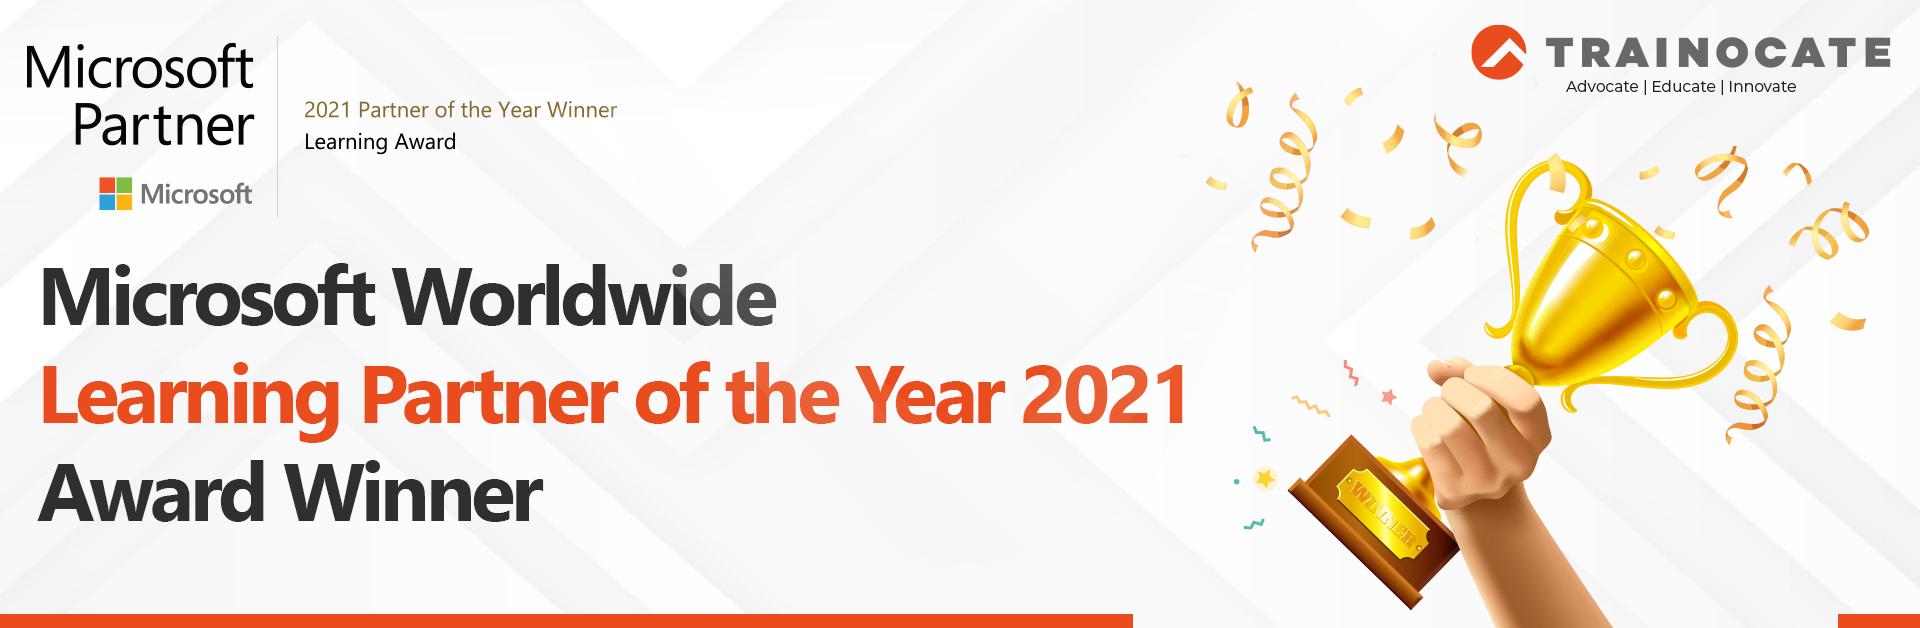 microsoft-award-winning-announcement.png